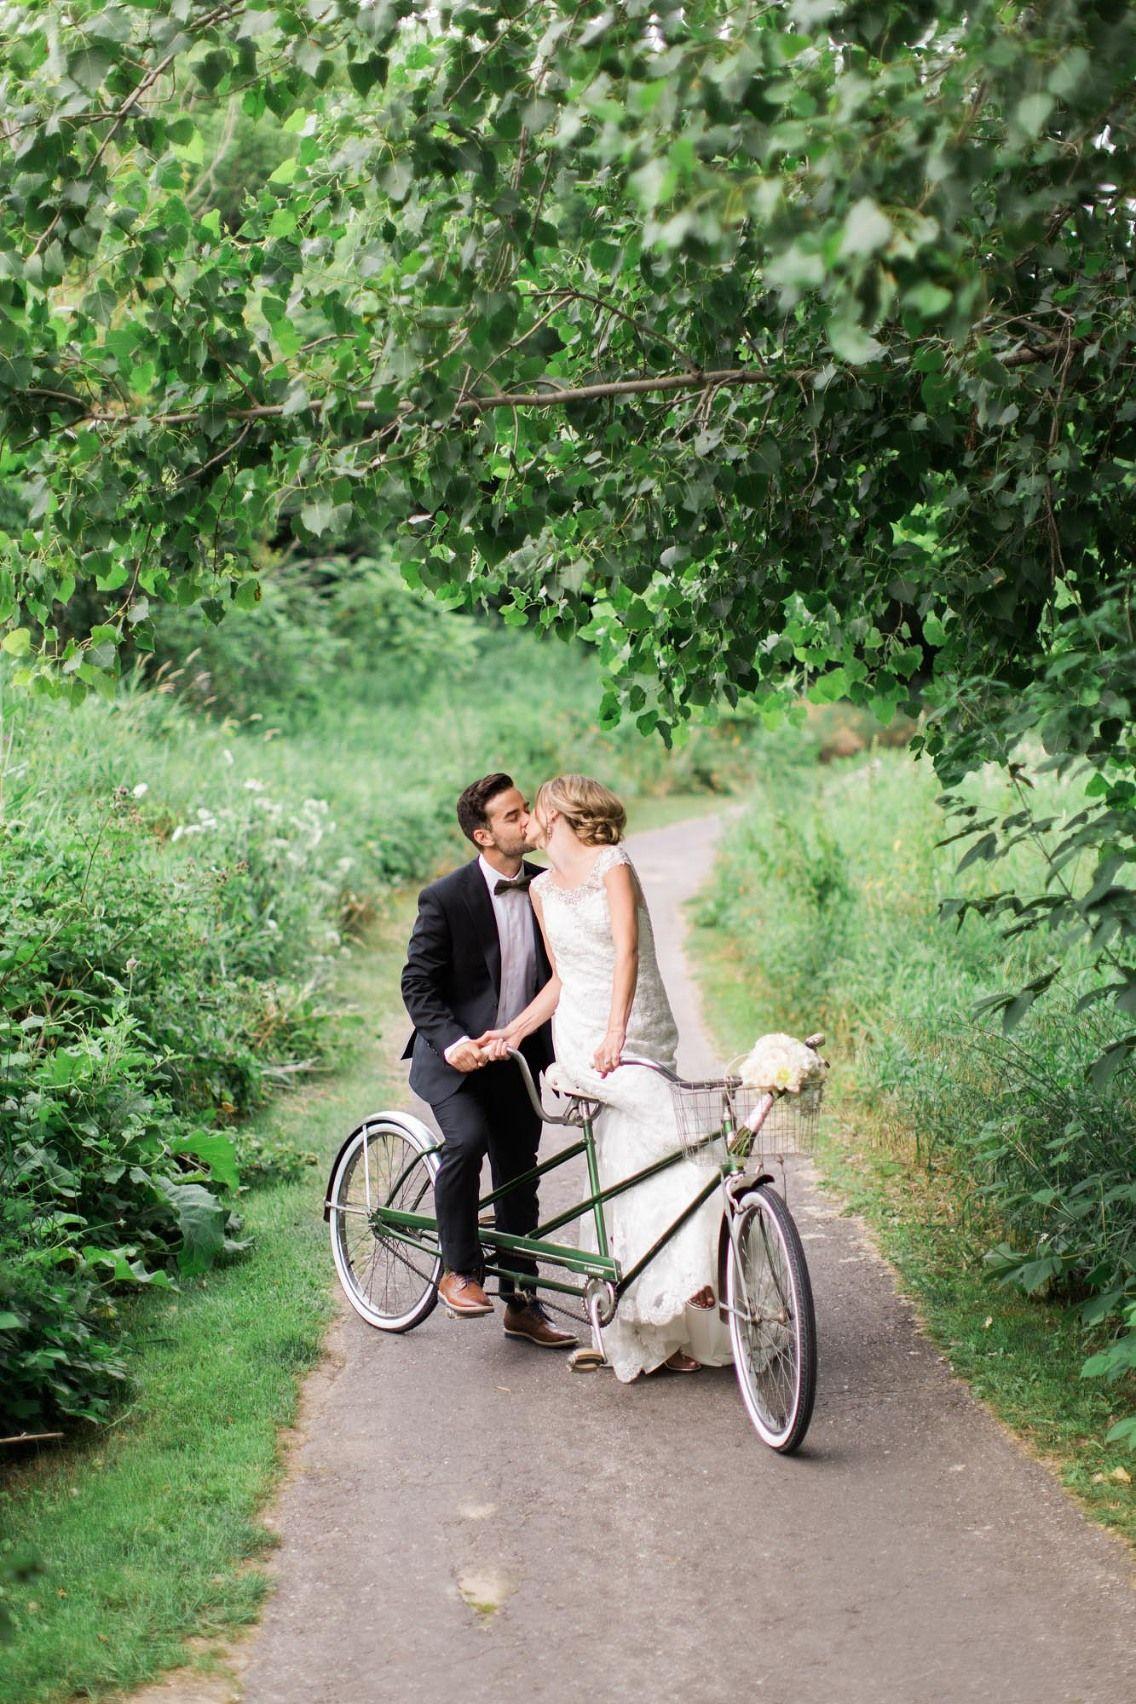 Martina Wendland photography / weddings / tandem bicycle